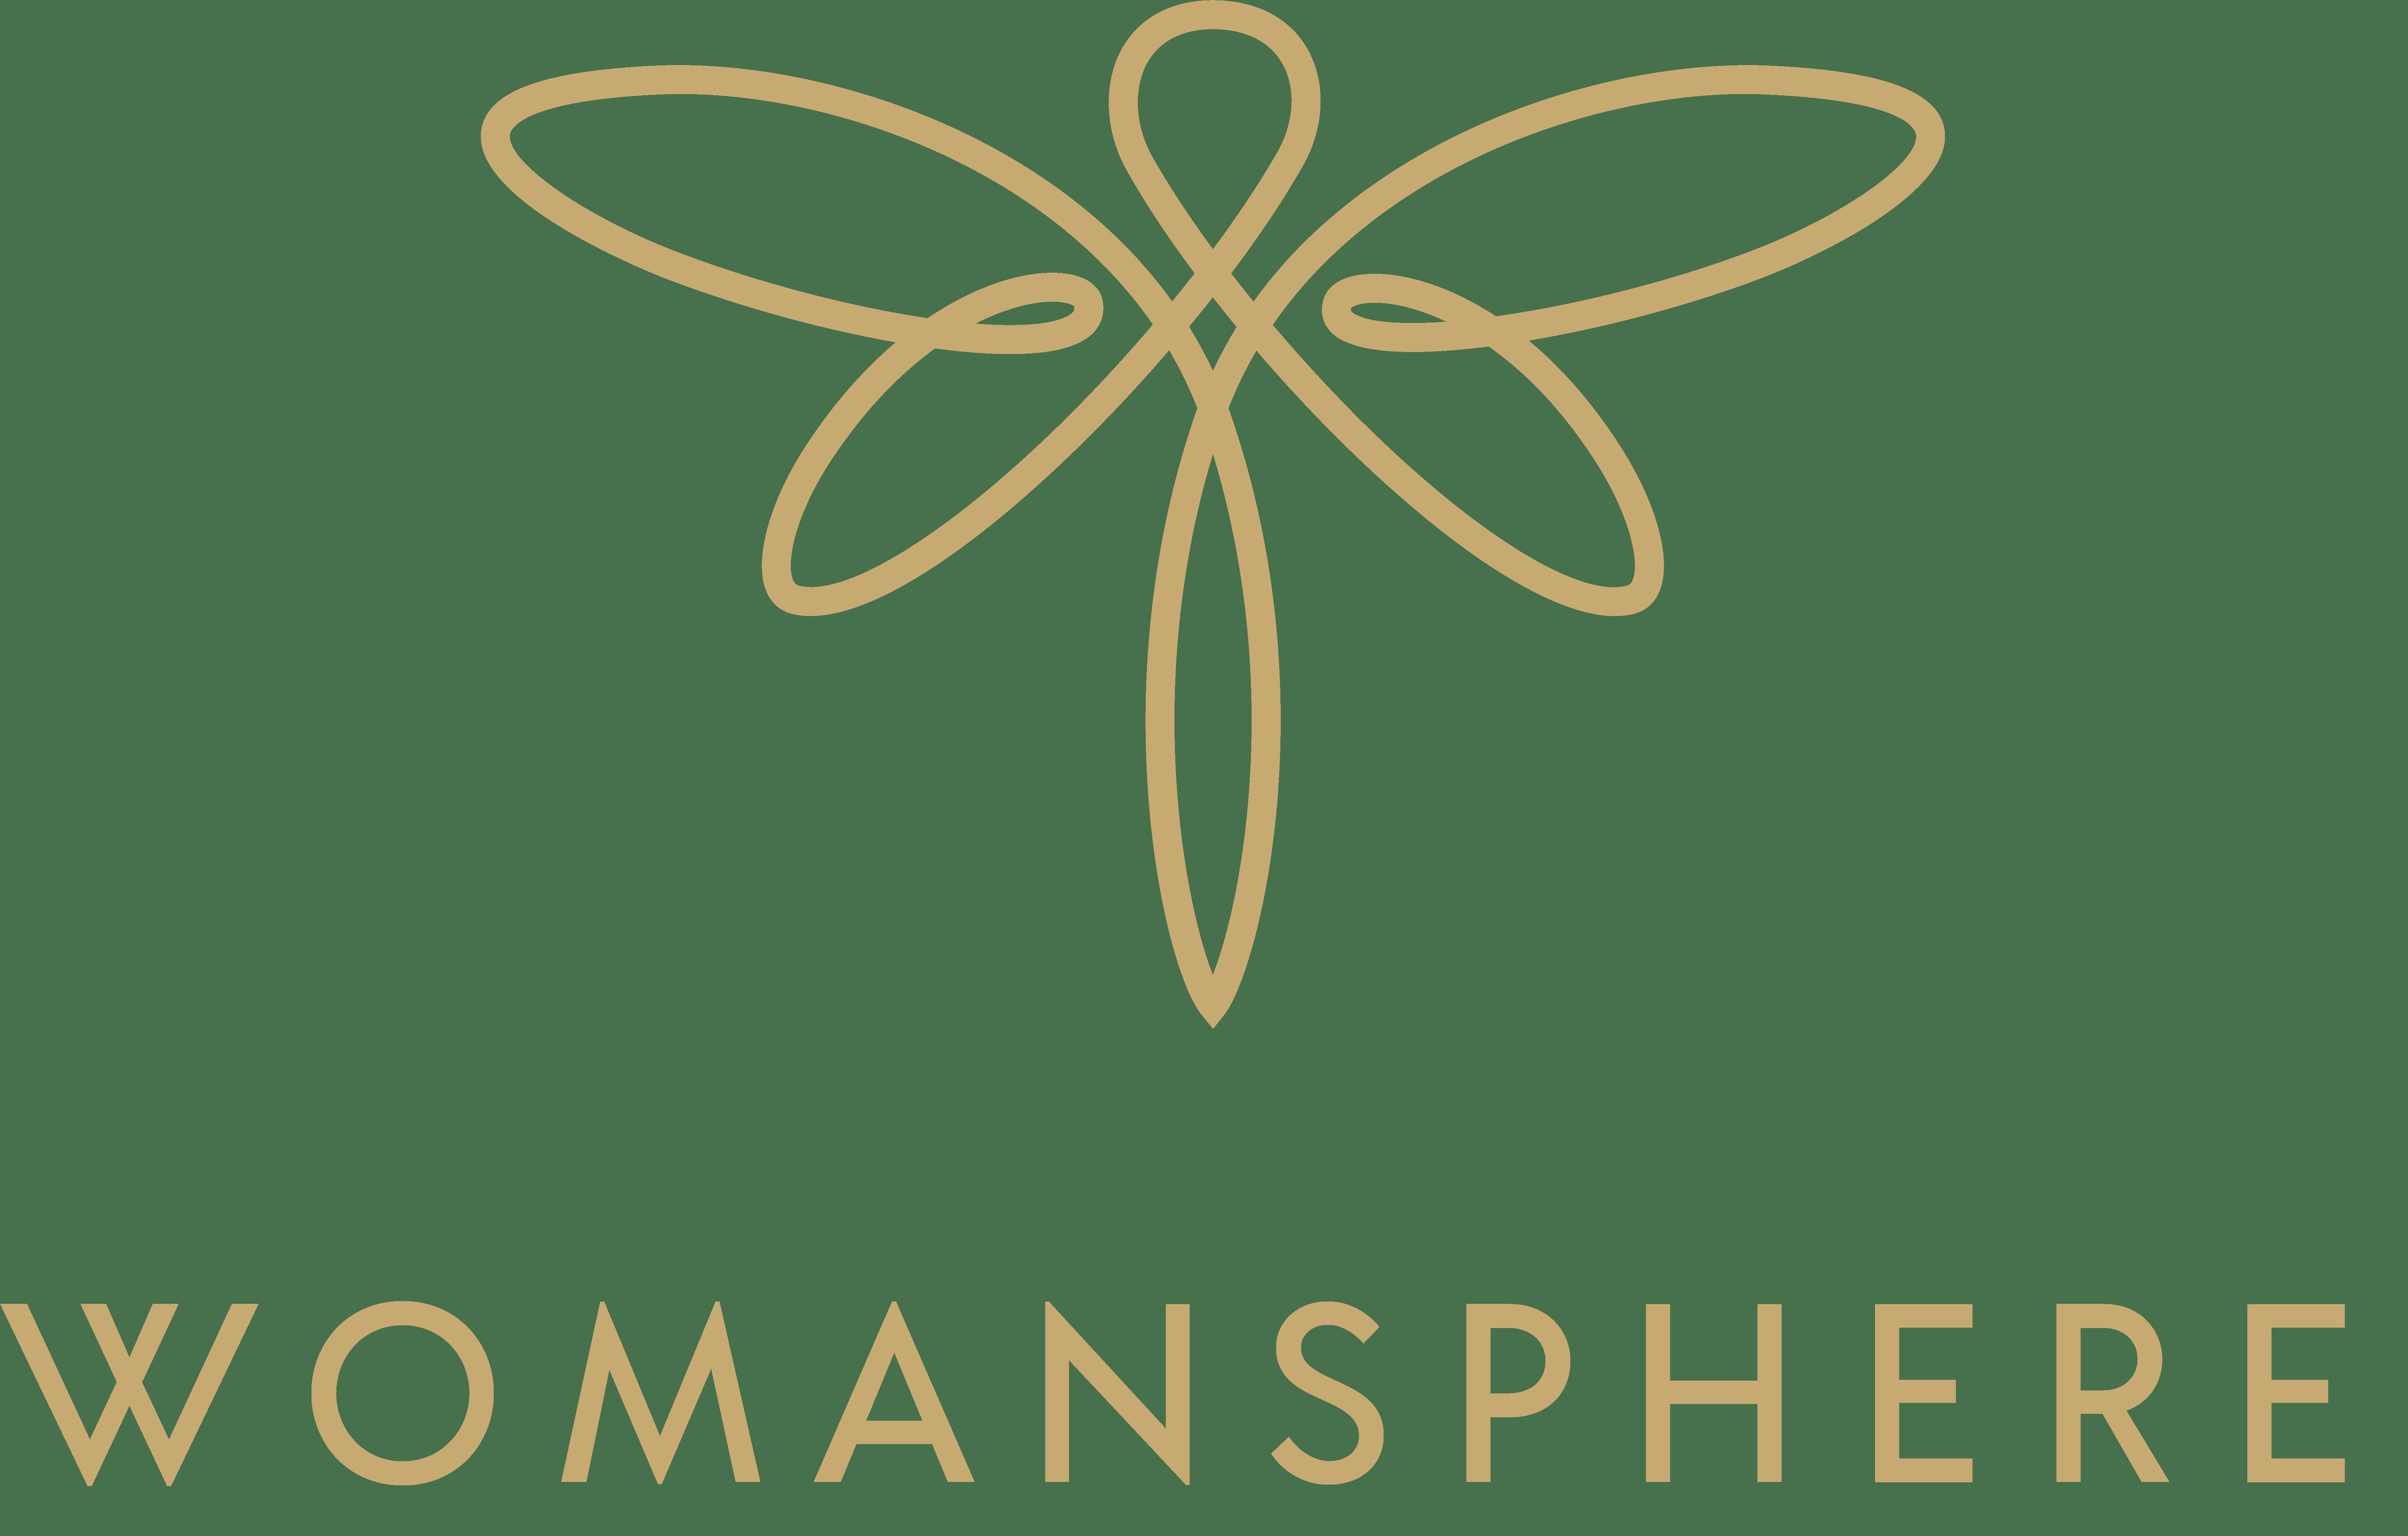 Womansphere